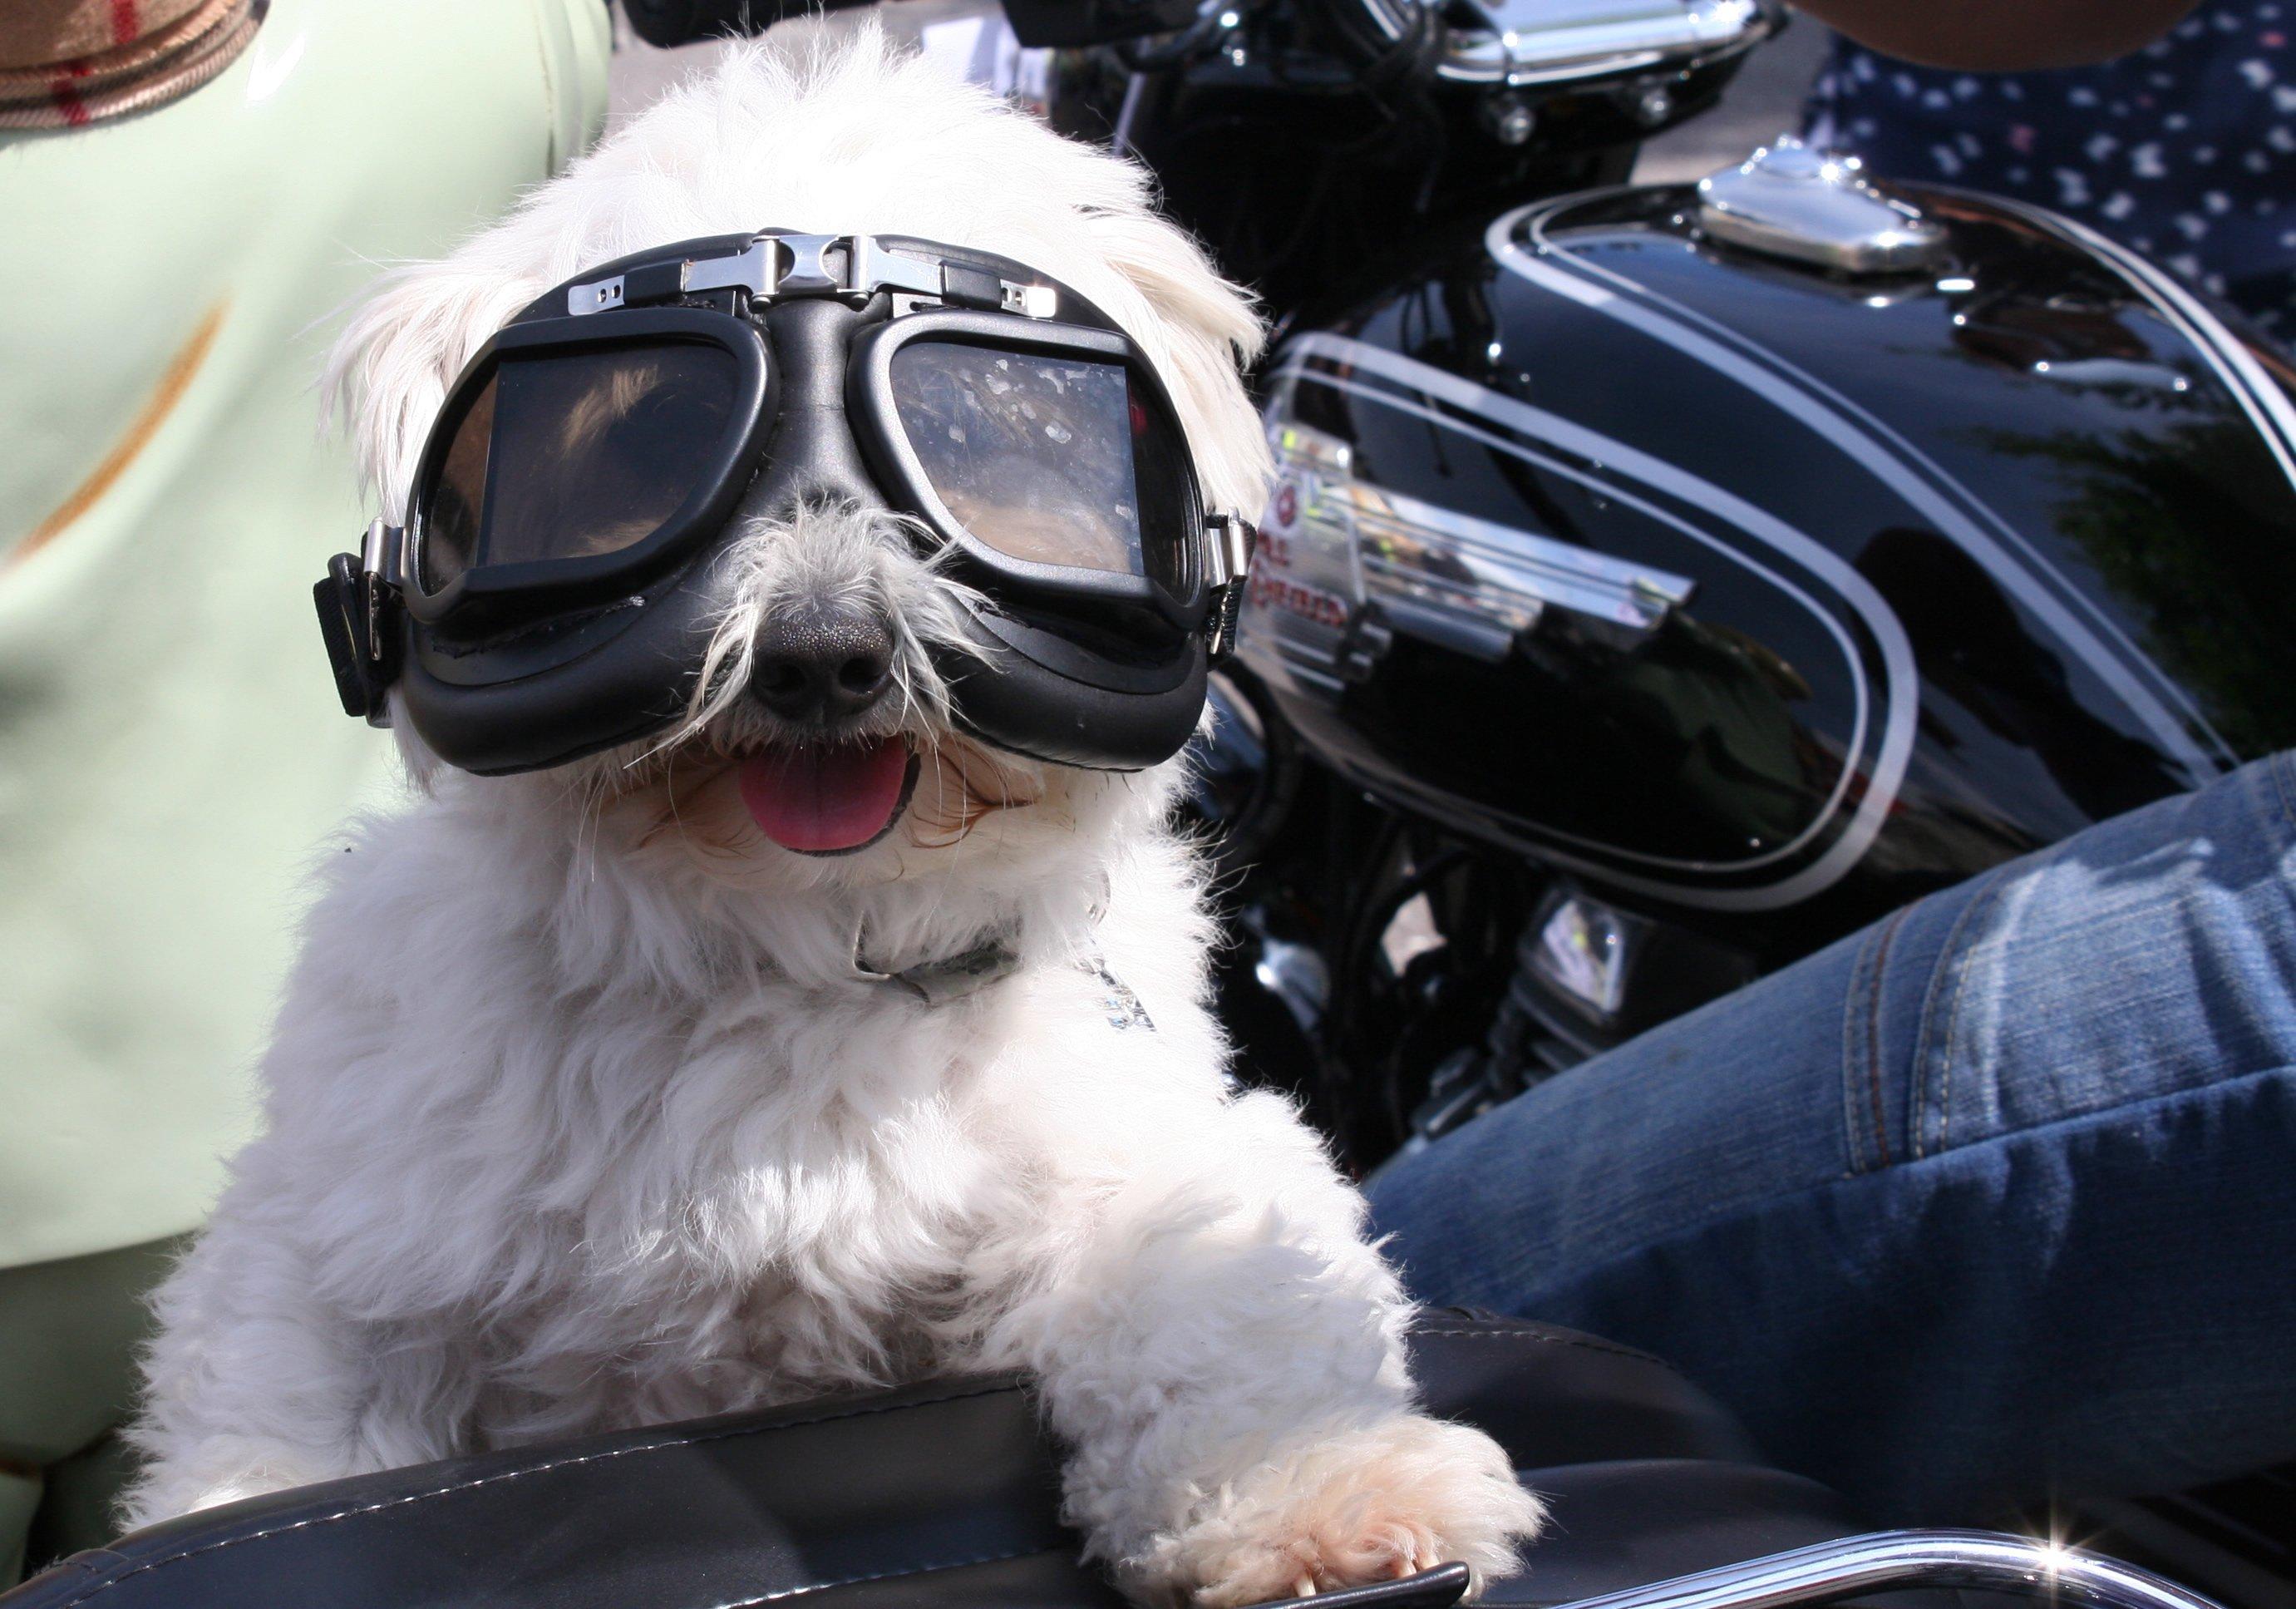 Motorcycle Tours Ireland